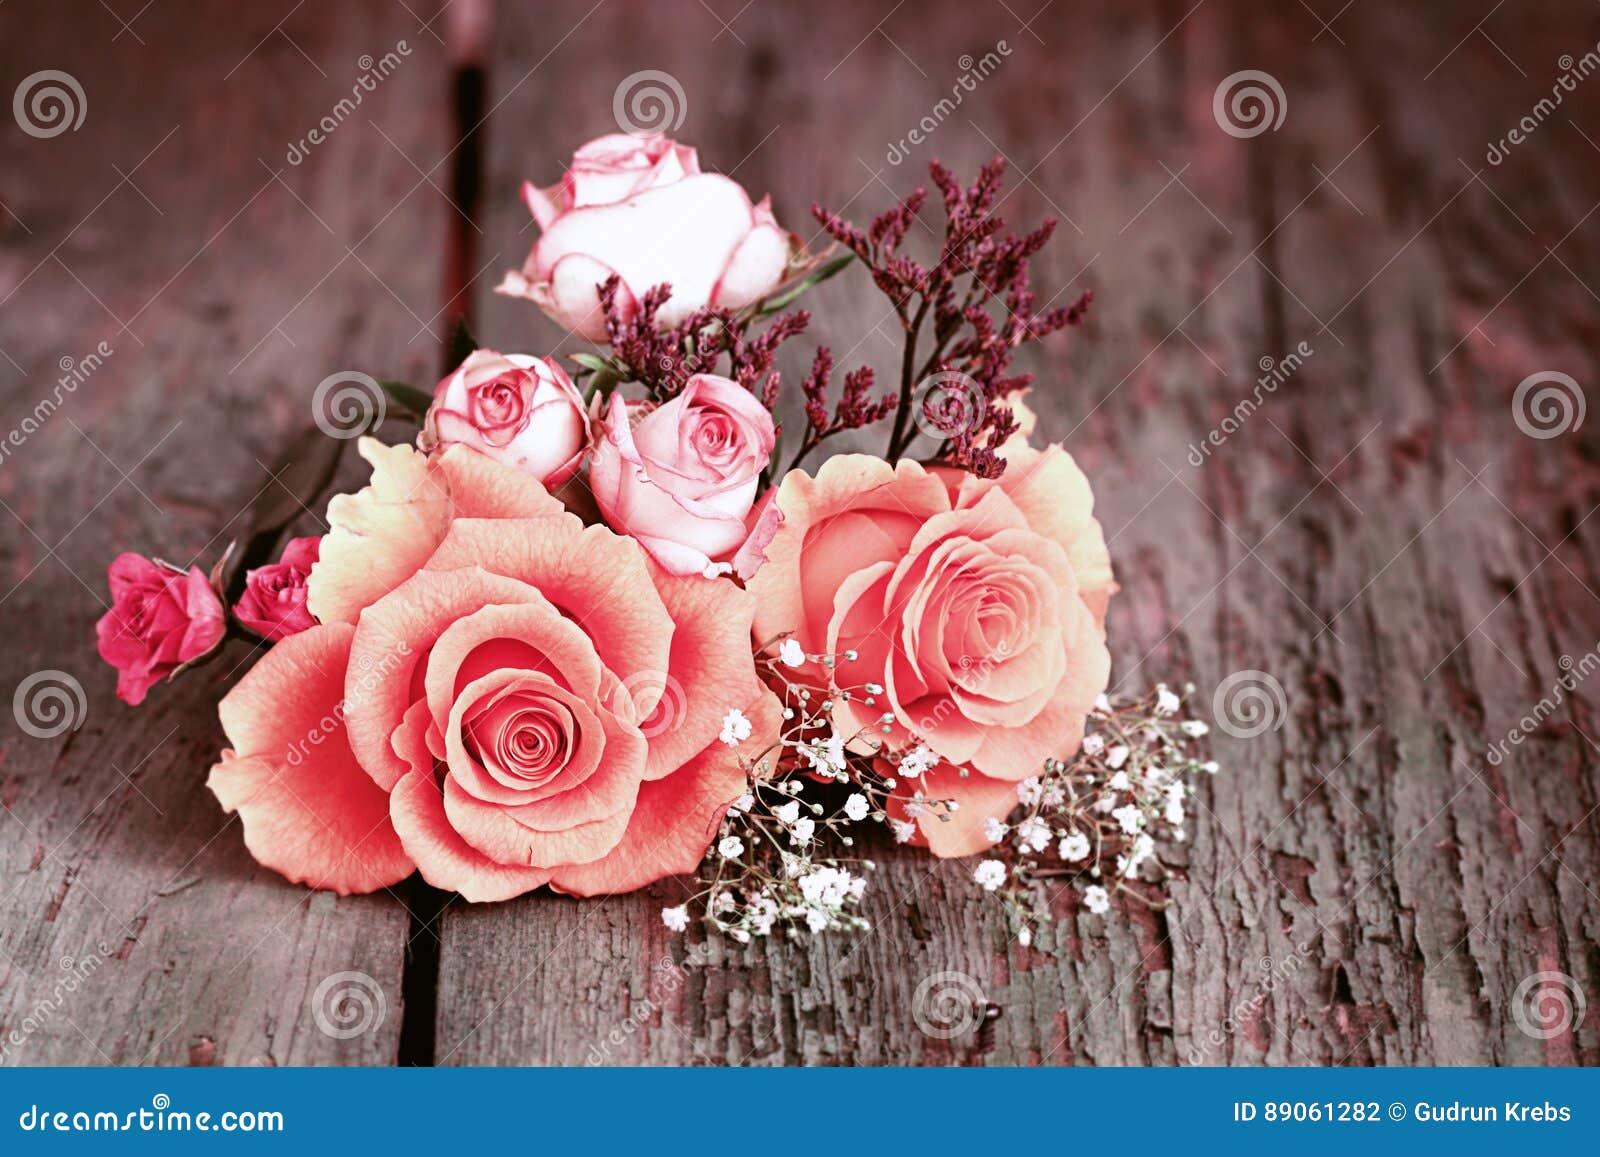 Stilleven met rozen in sjofele elegante stijl